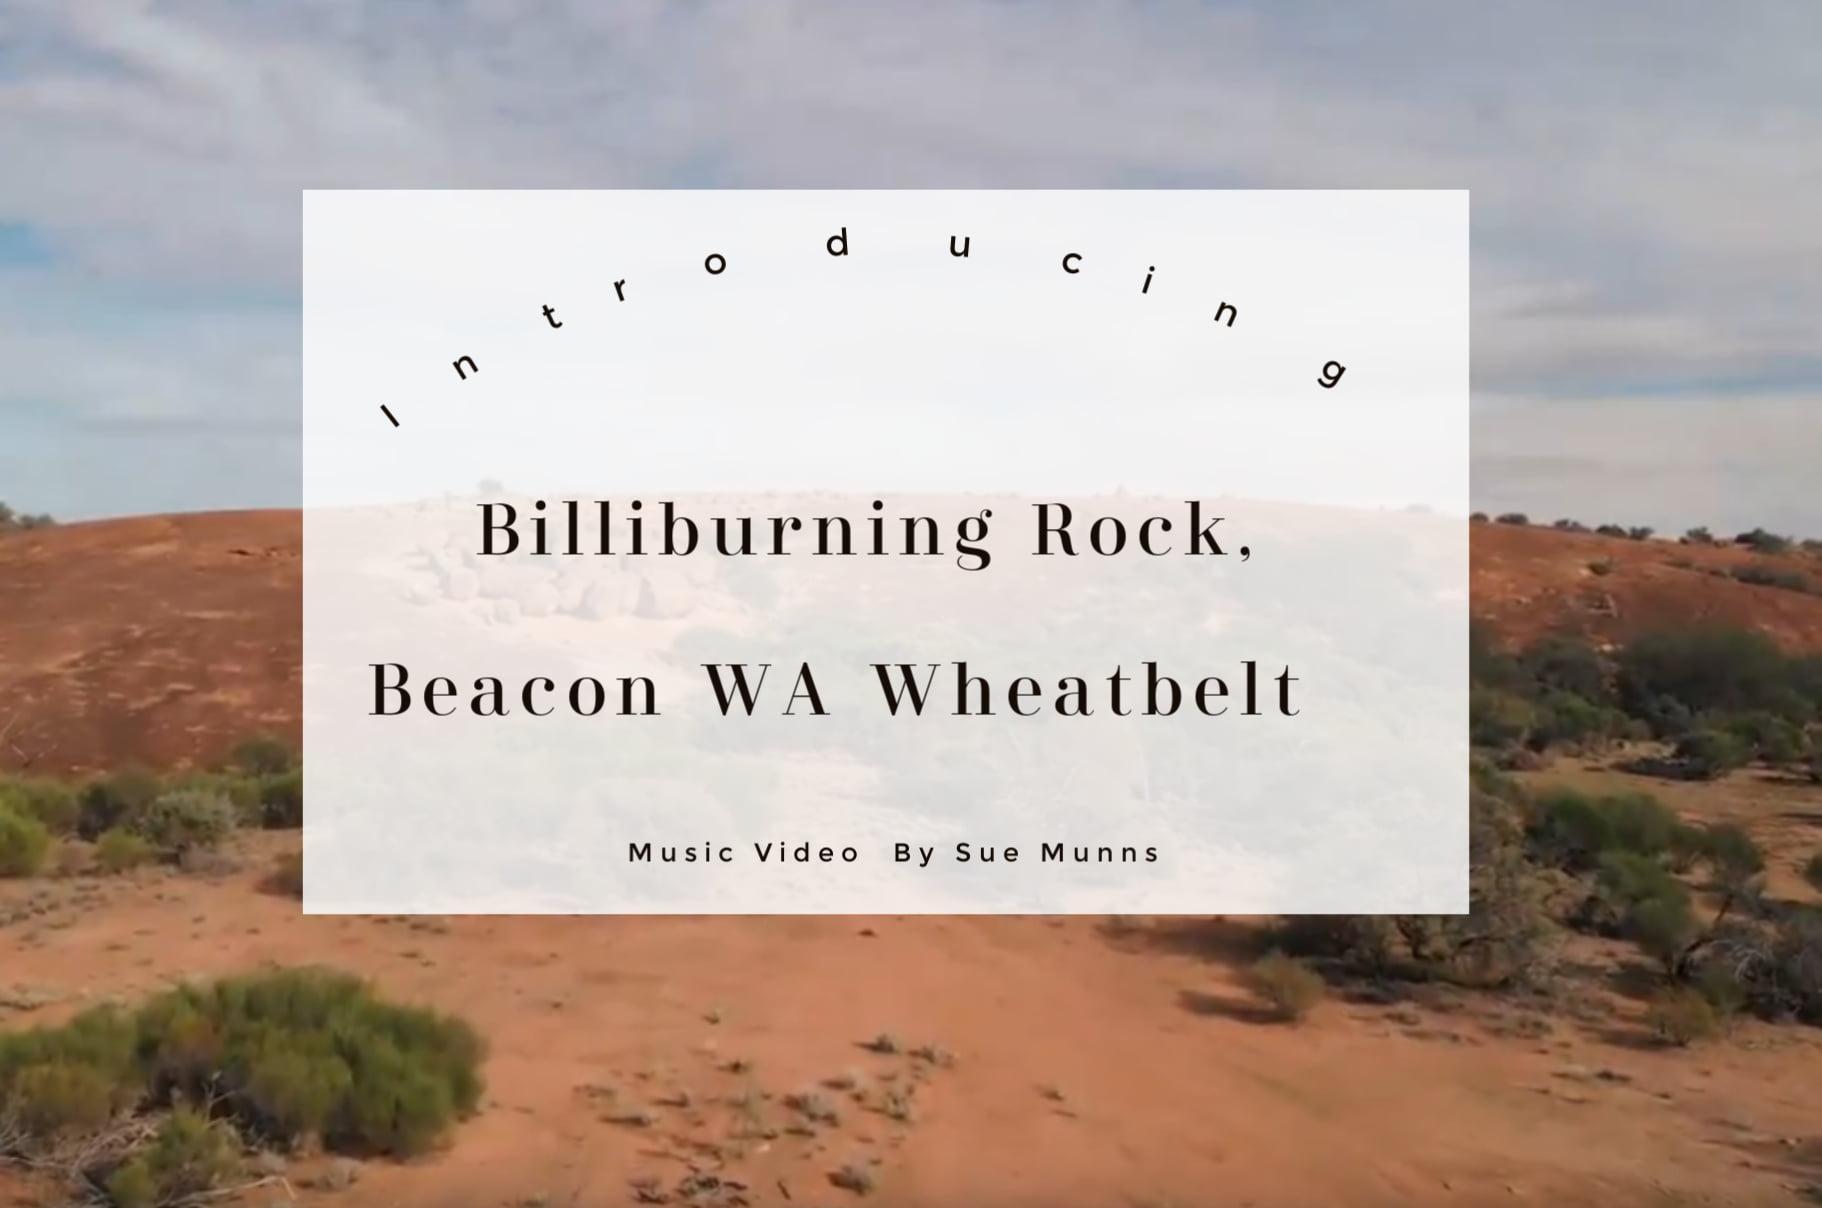 Billiburning Rock Video trailer